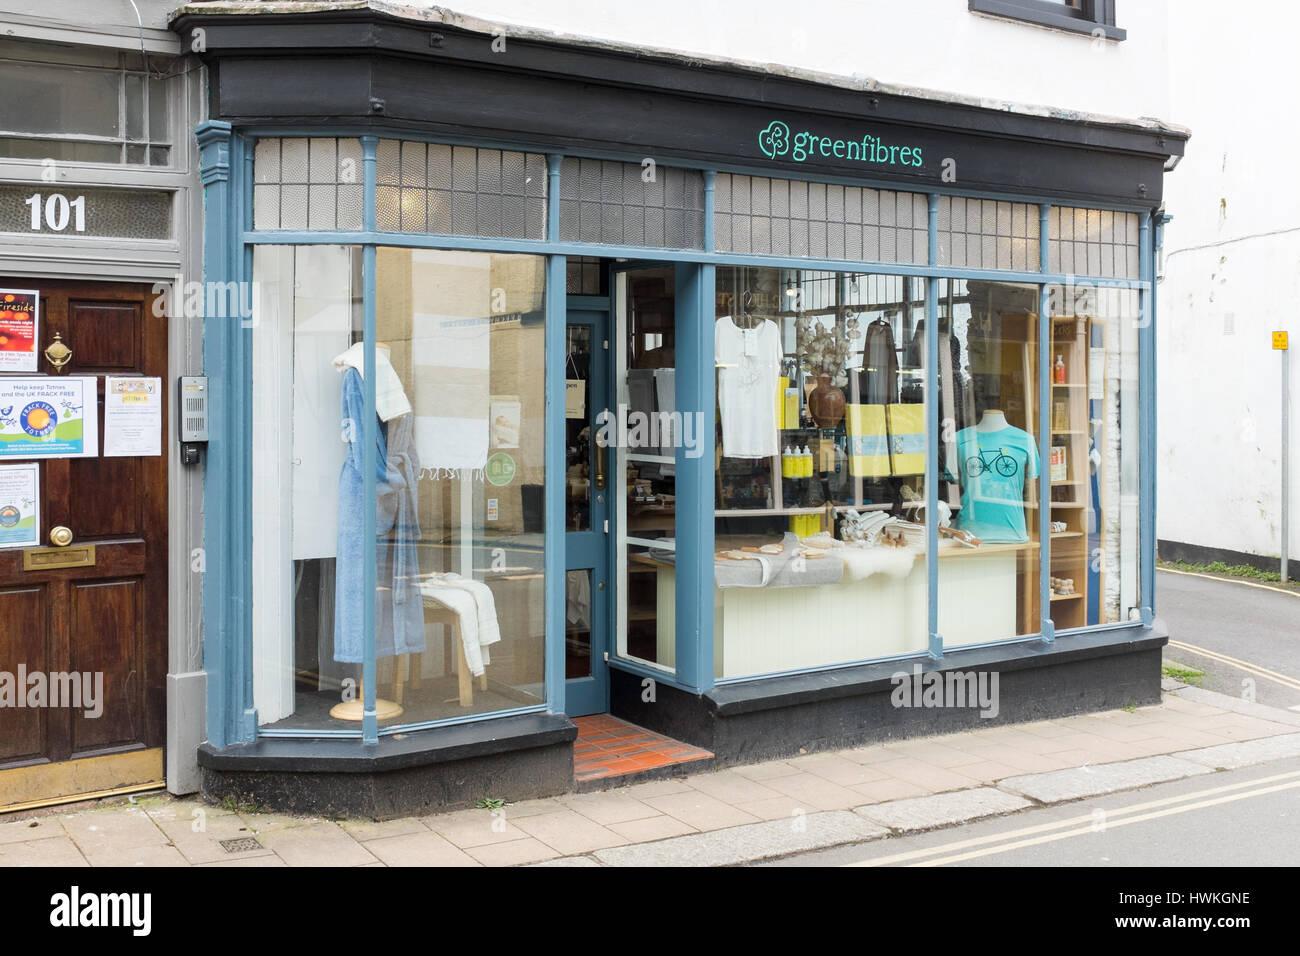 Greenfibres organic and natural fibres shop in Totnes High Street, Devon - Stock Image